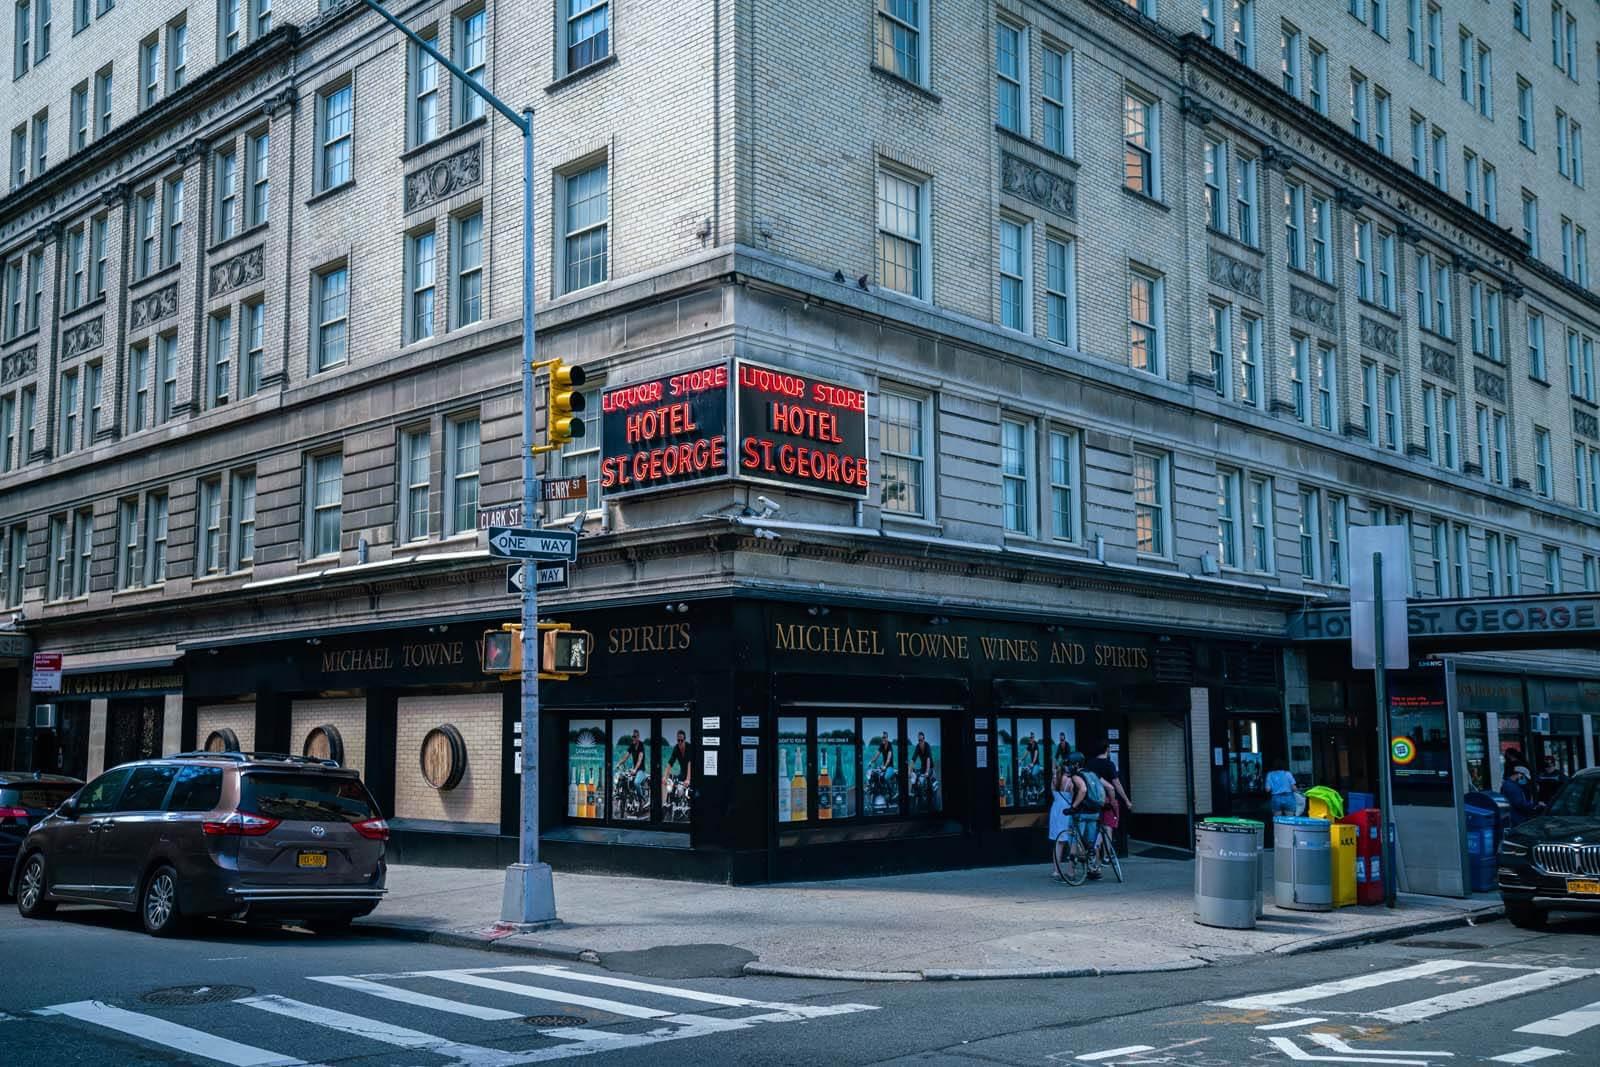 Hotel St George in Brooklyn Heights